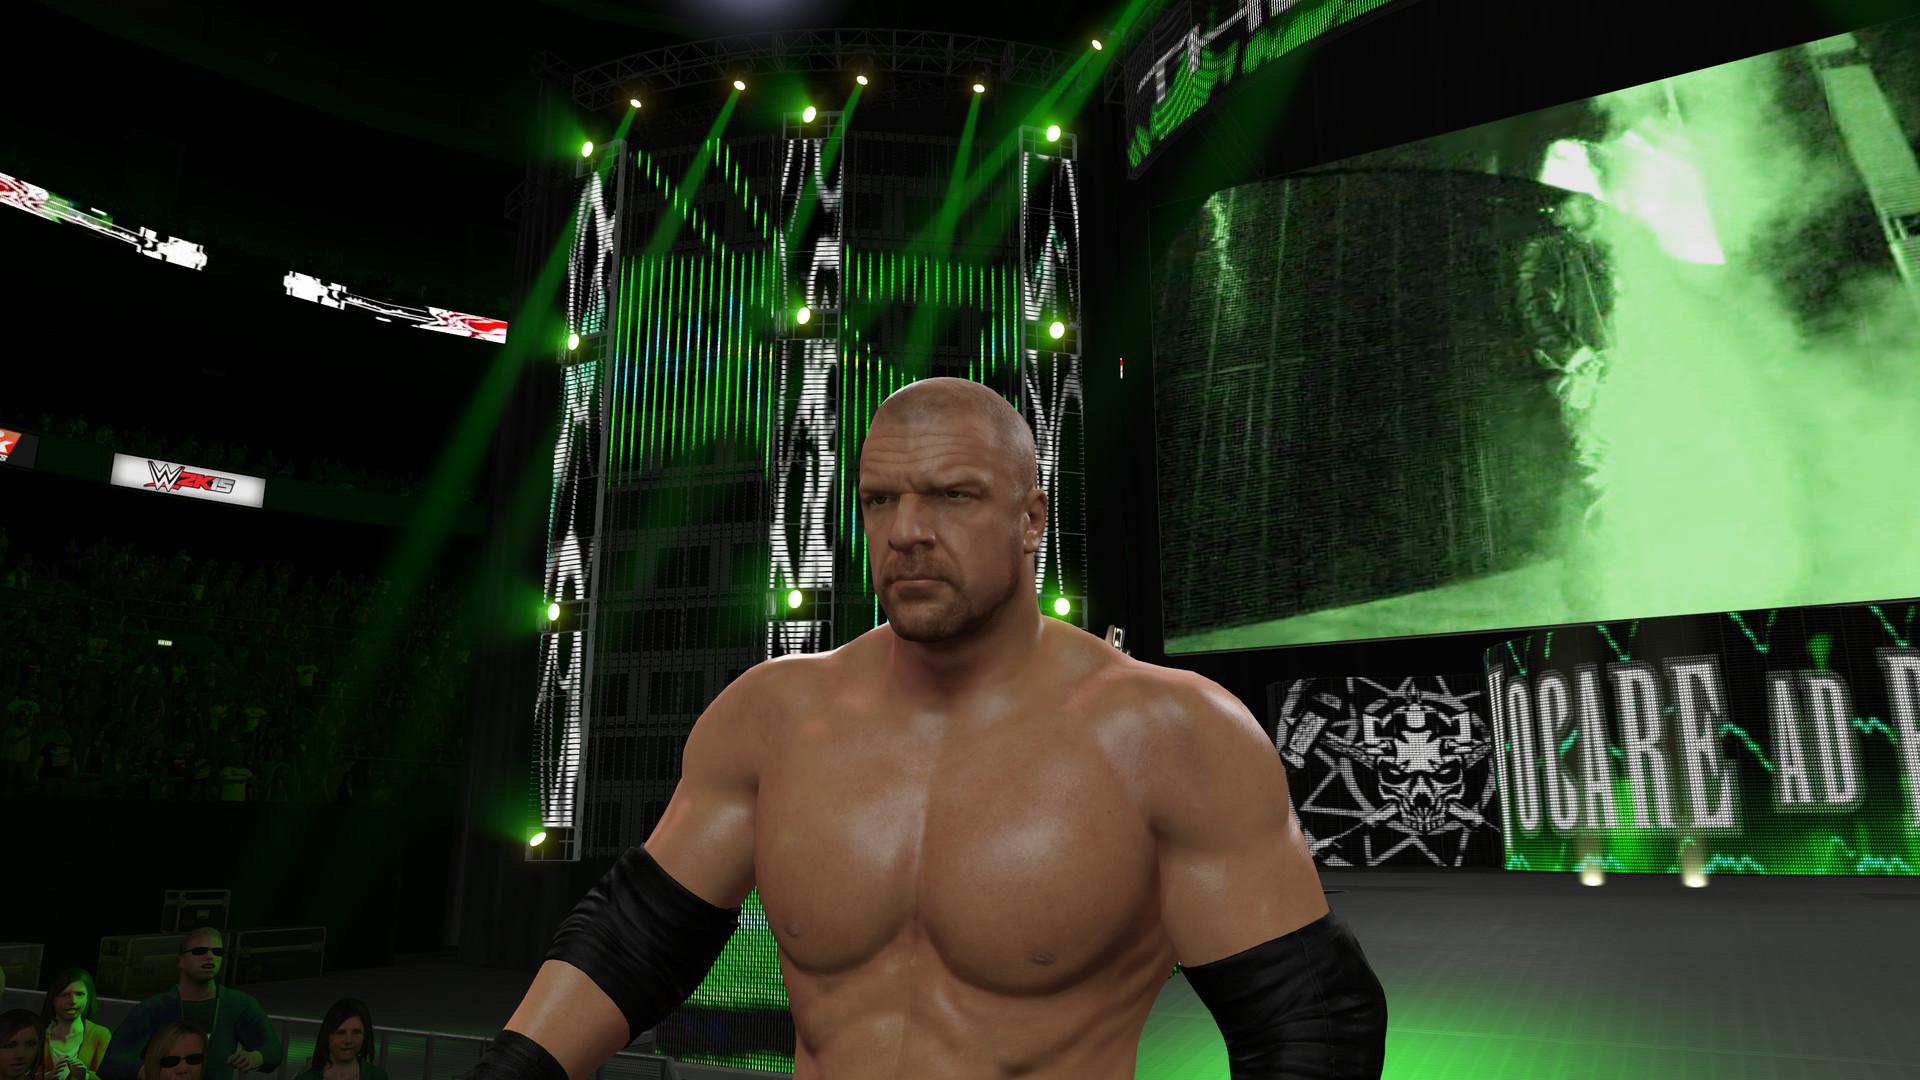 WWE 2K15 ESPAÑOL Full PC + DLC Pack Addon (RELOADED) + REPACK 5 DVD5 (JPW) 2